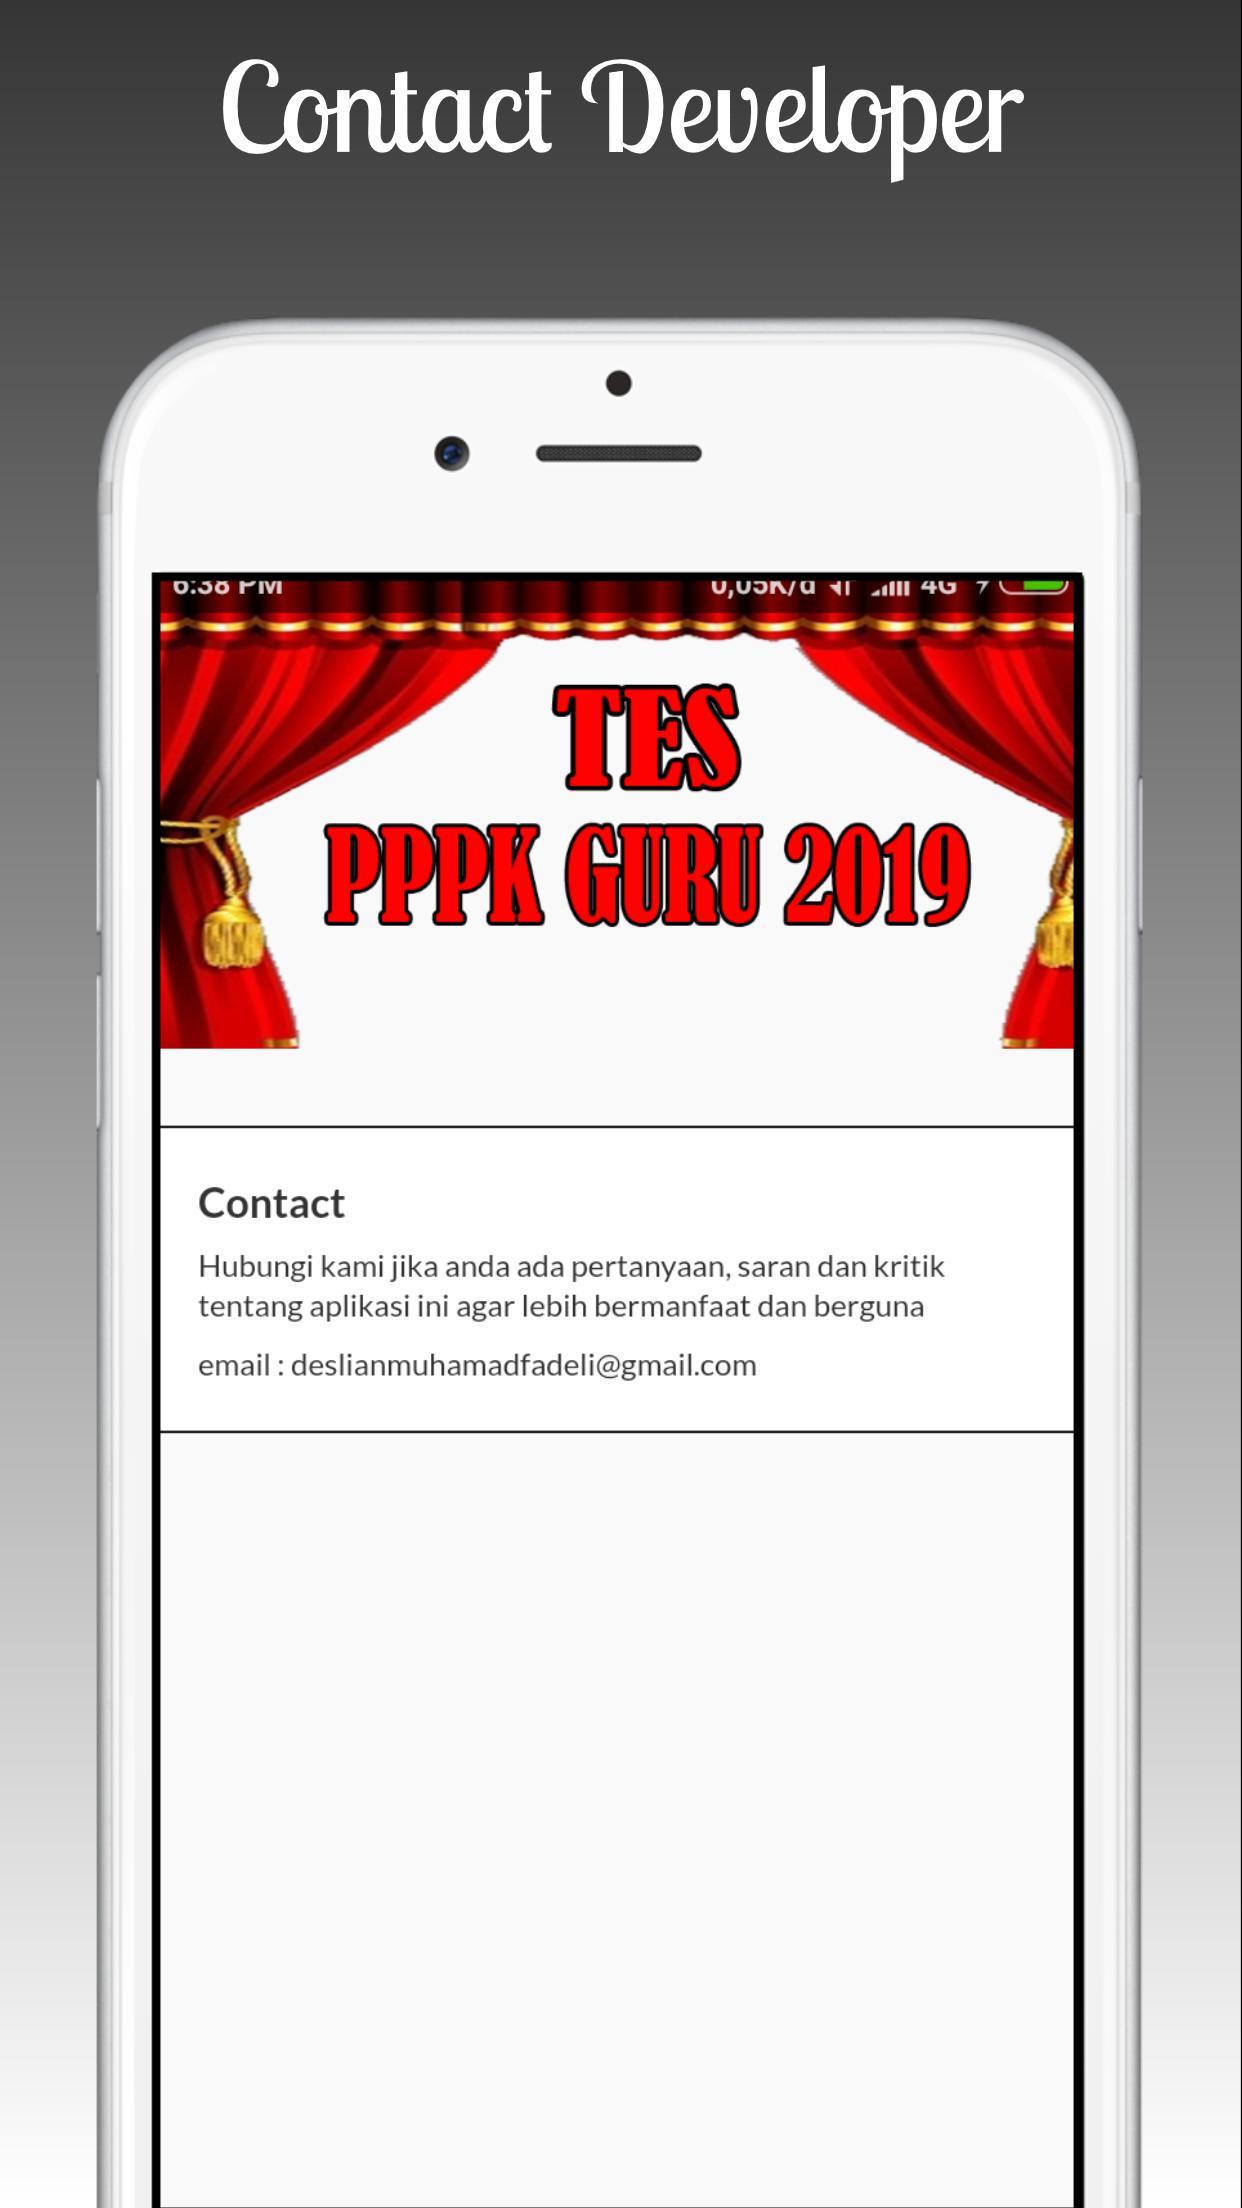 Soal Pppk Guru 2020 For Android Apk Download